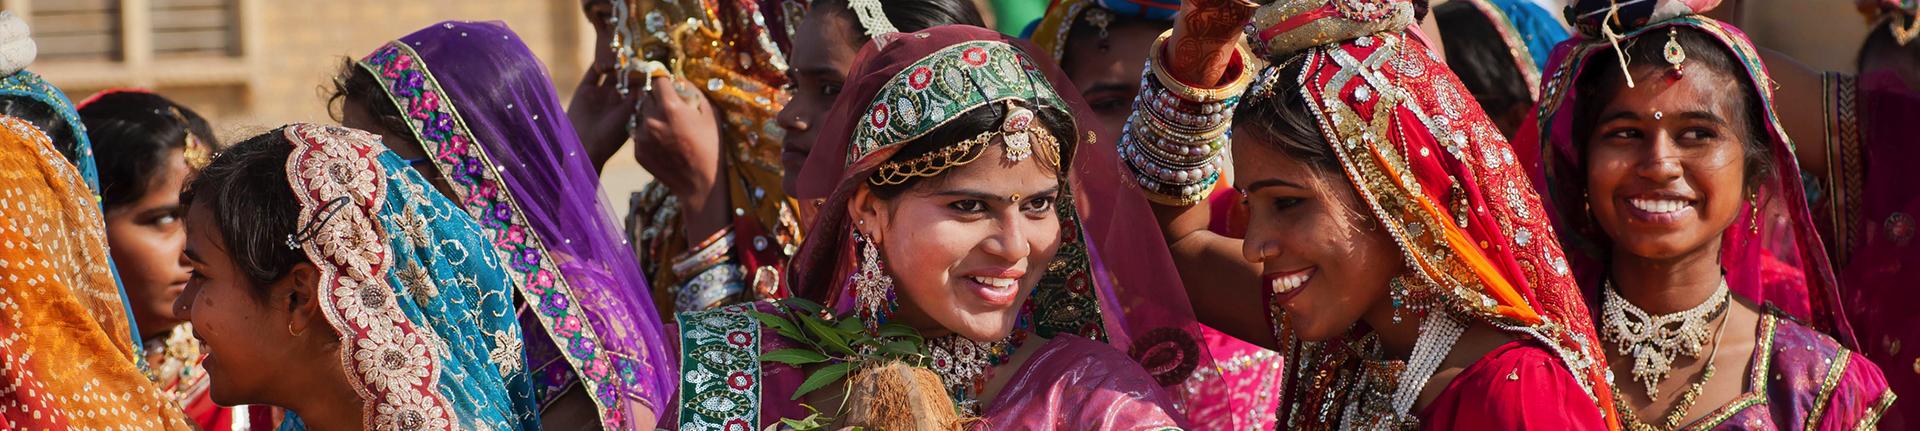 A Índia pelo olhar feminino